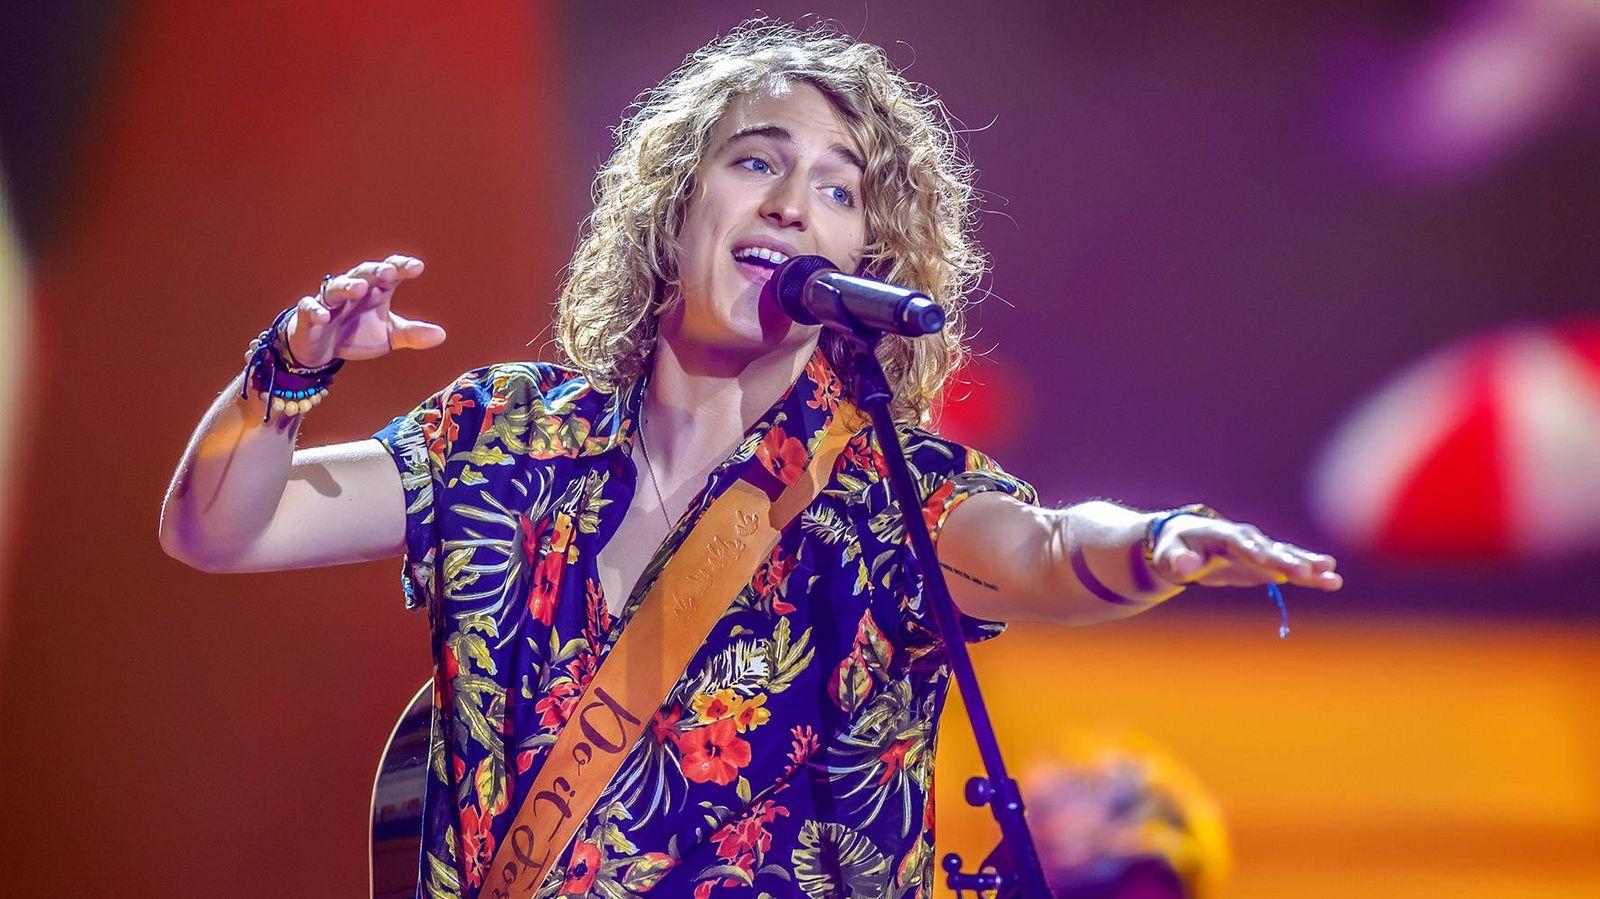 Foto: Manel Navarro, representante de España en Eurovisión 2017